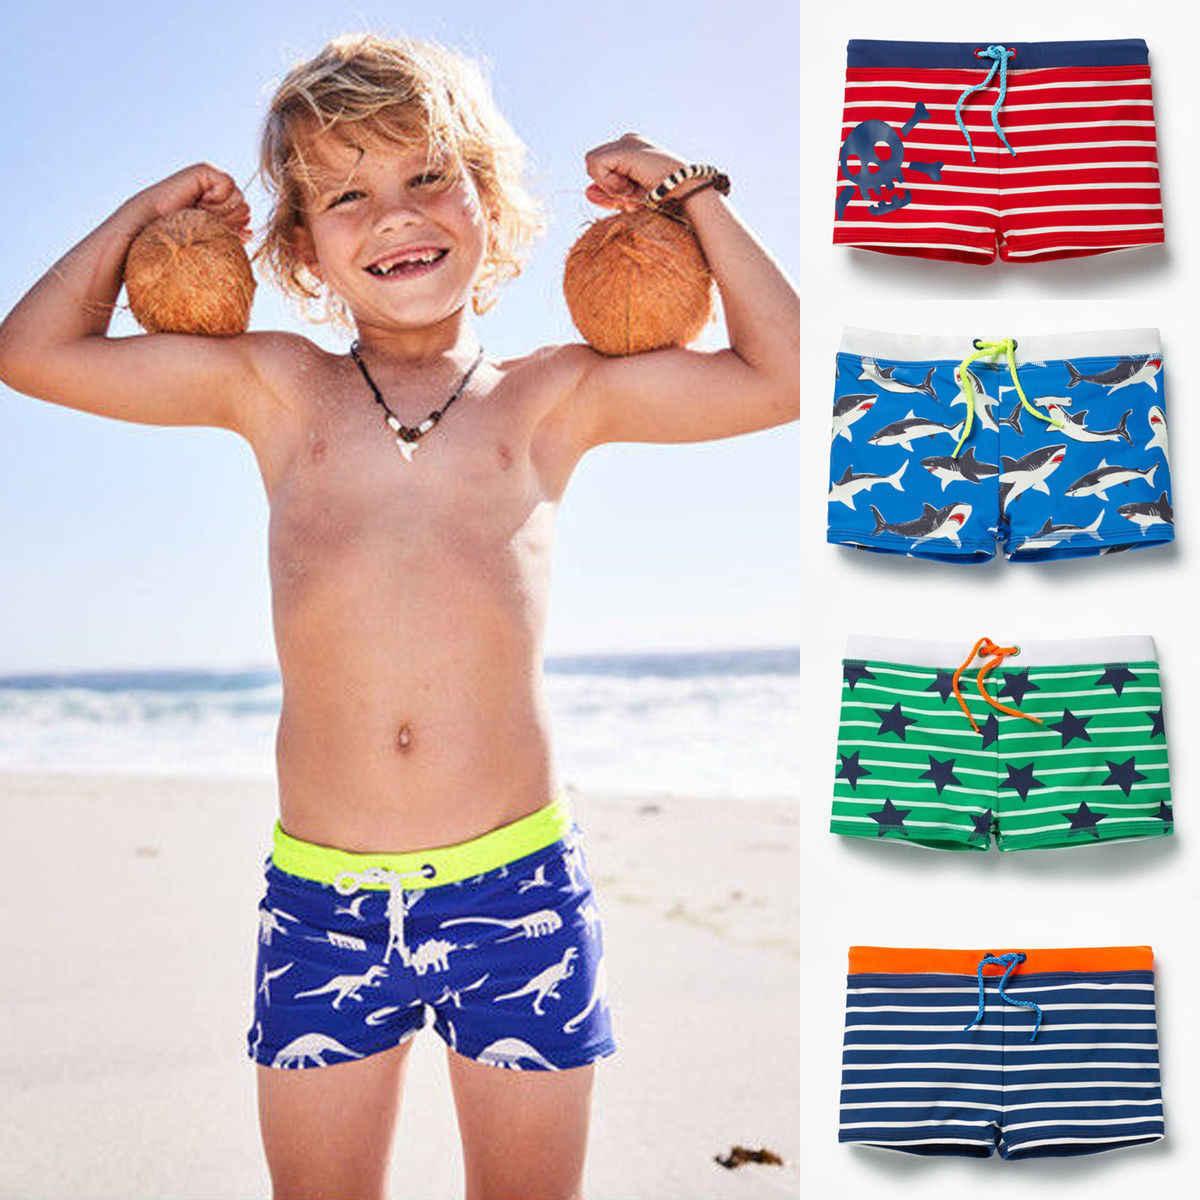 60dd980b86 Cool Handsome Toddler Boy Kid Swimming Shorts Swimwear Summer Beach Swim  Trunks Pants Clothes Striped Star